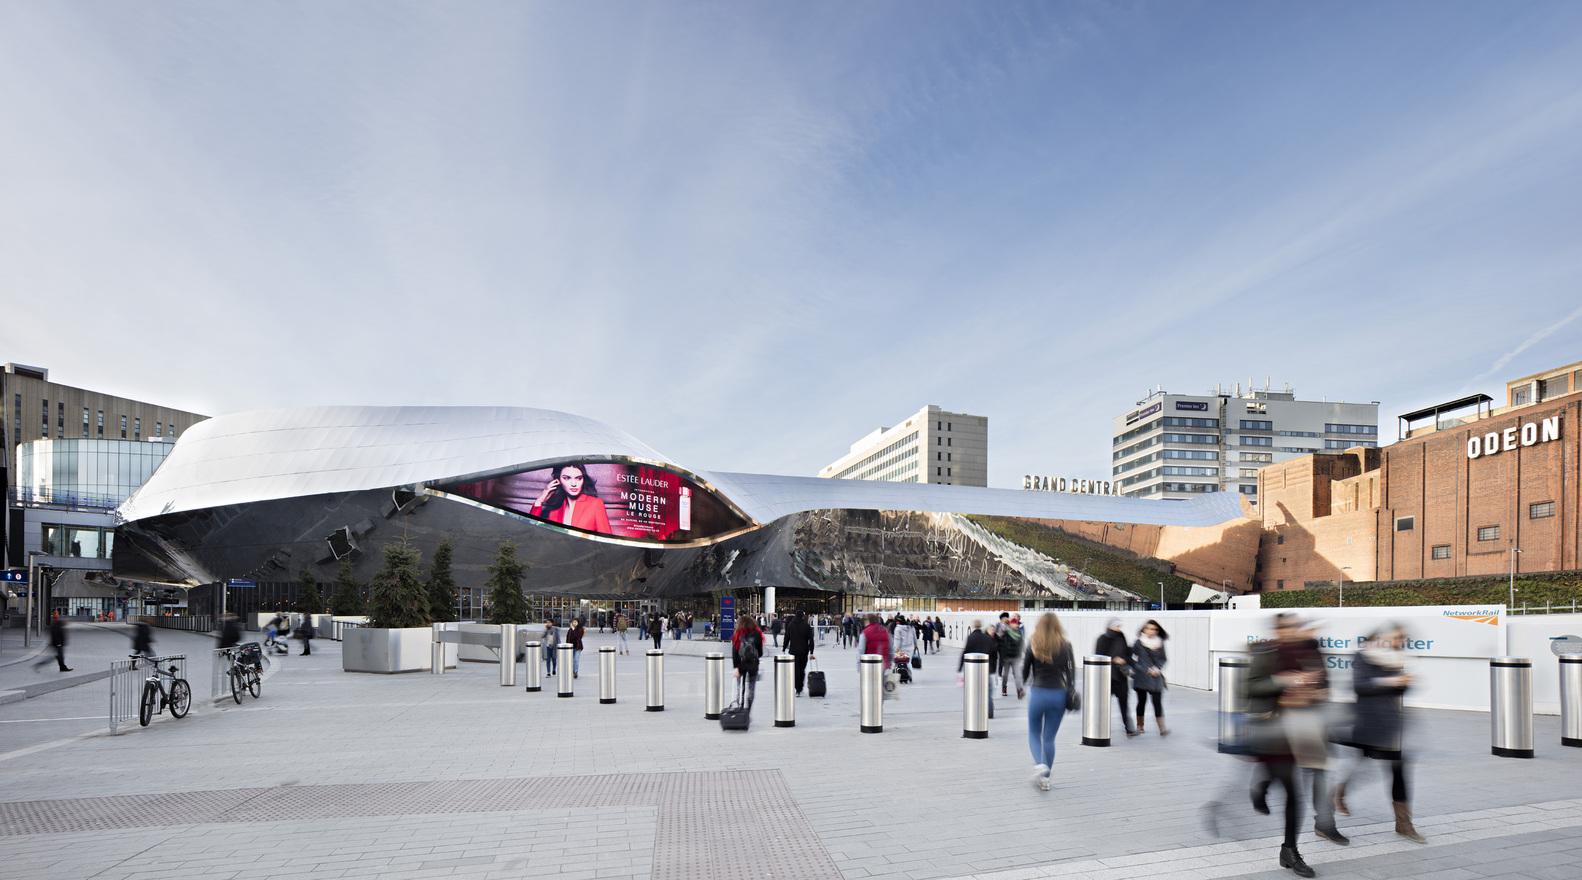 Металлическая отделка фасада здания вокзала - Фото 1